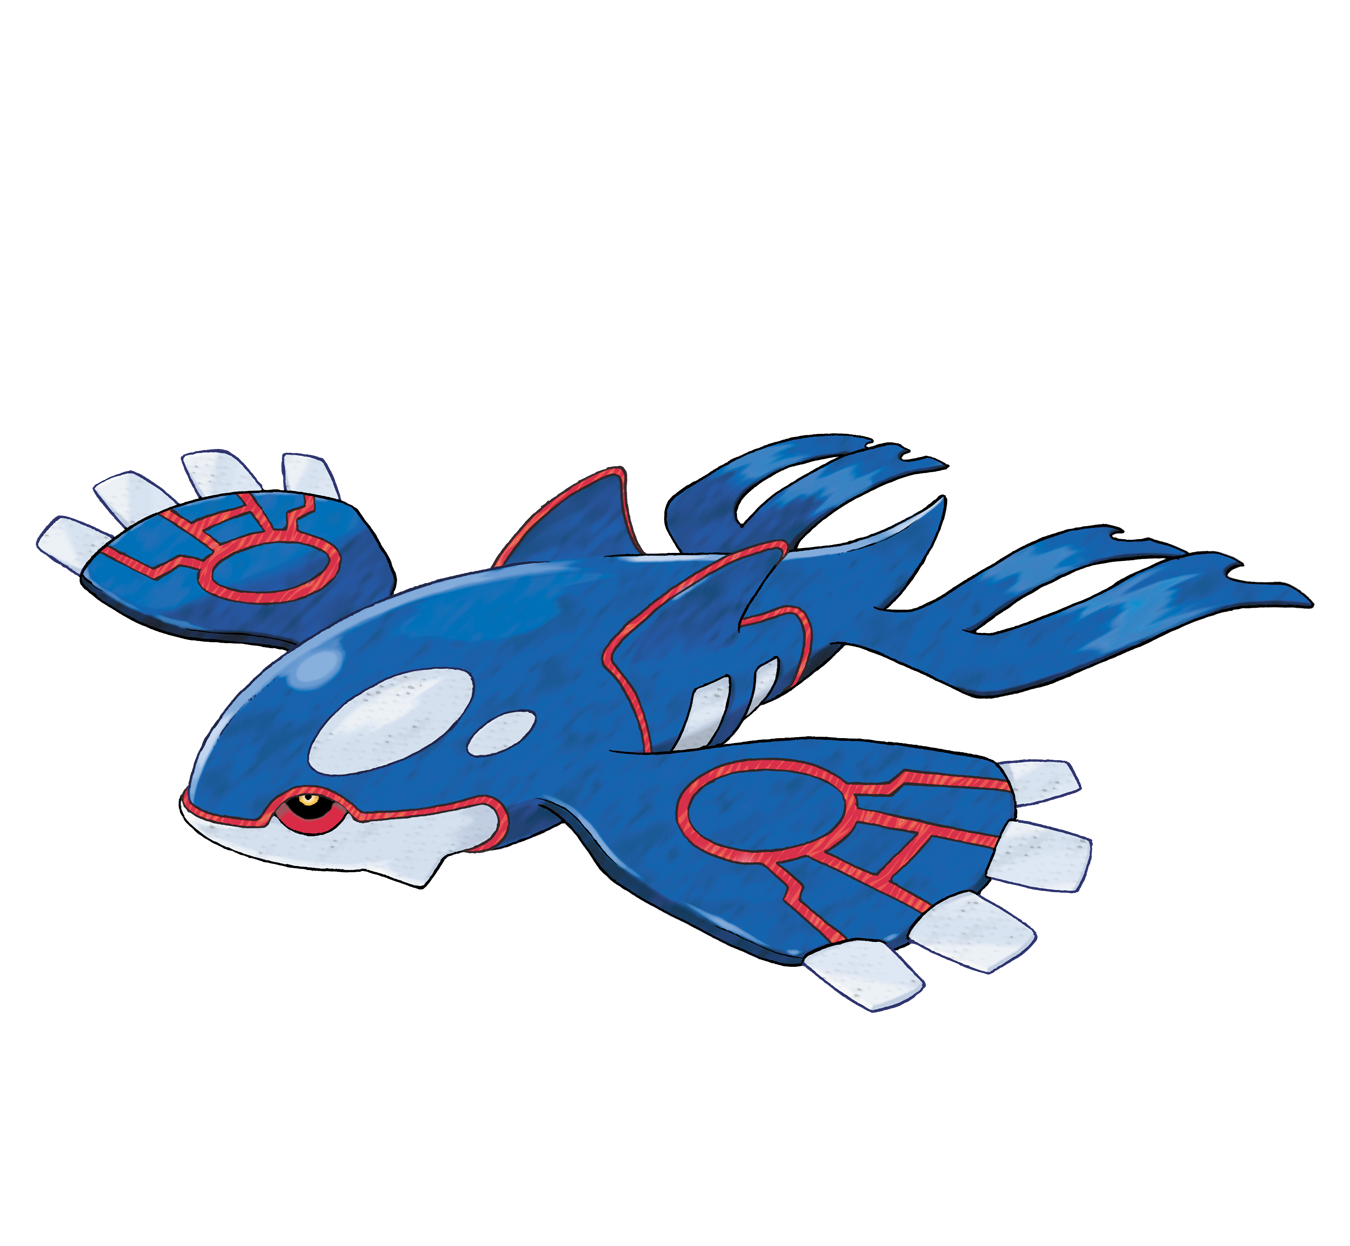 cual es tu pokemon favorito? Kyogre